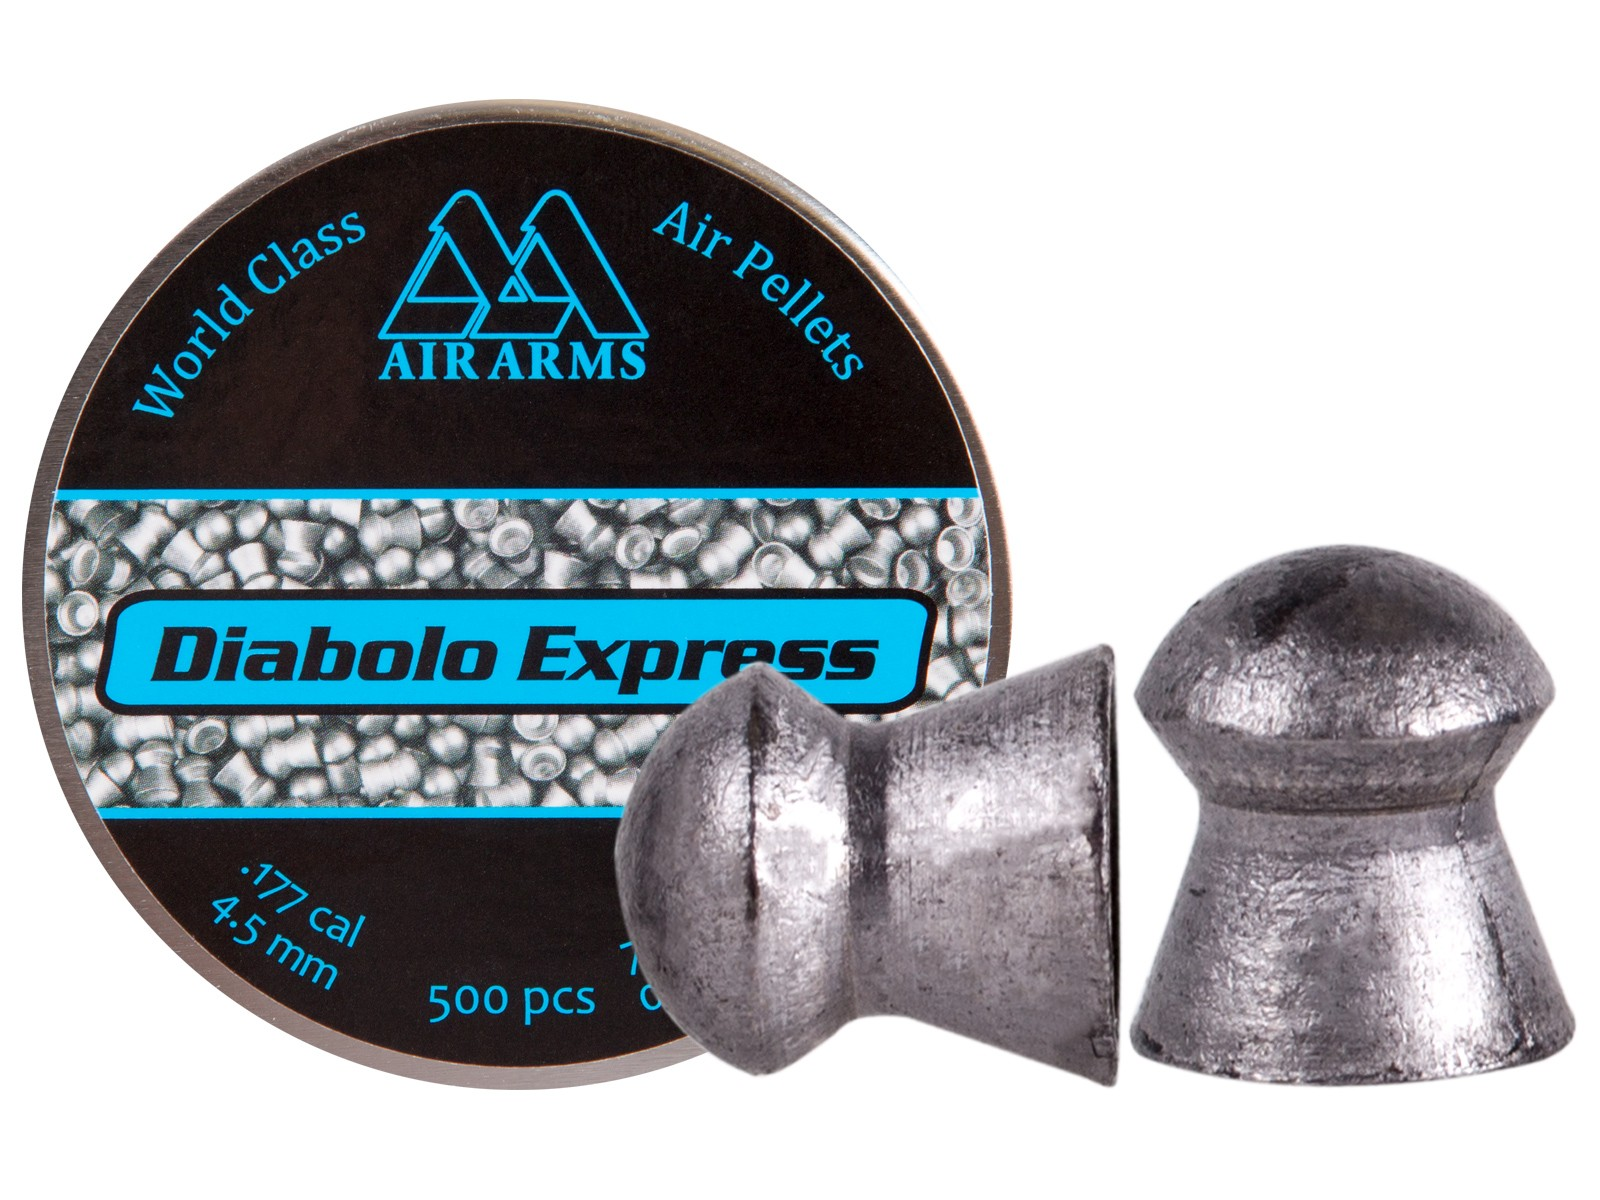 Air Arms Diabolo Express .177 Cal, 7.87 Grains, Domed, 500ct